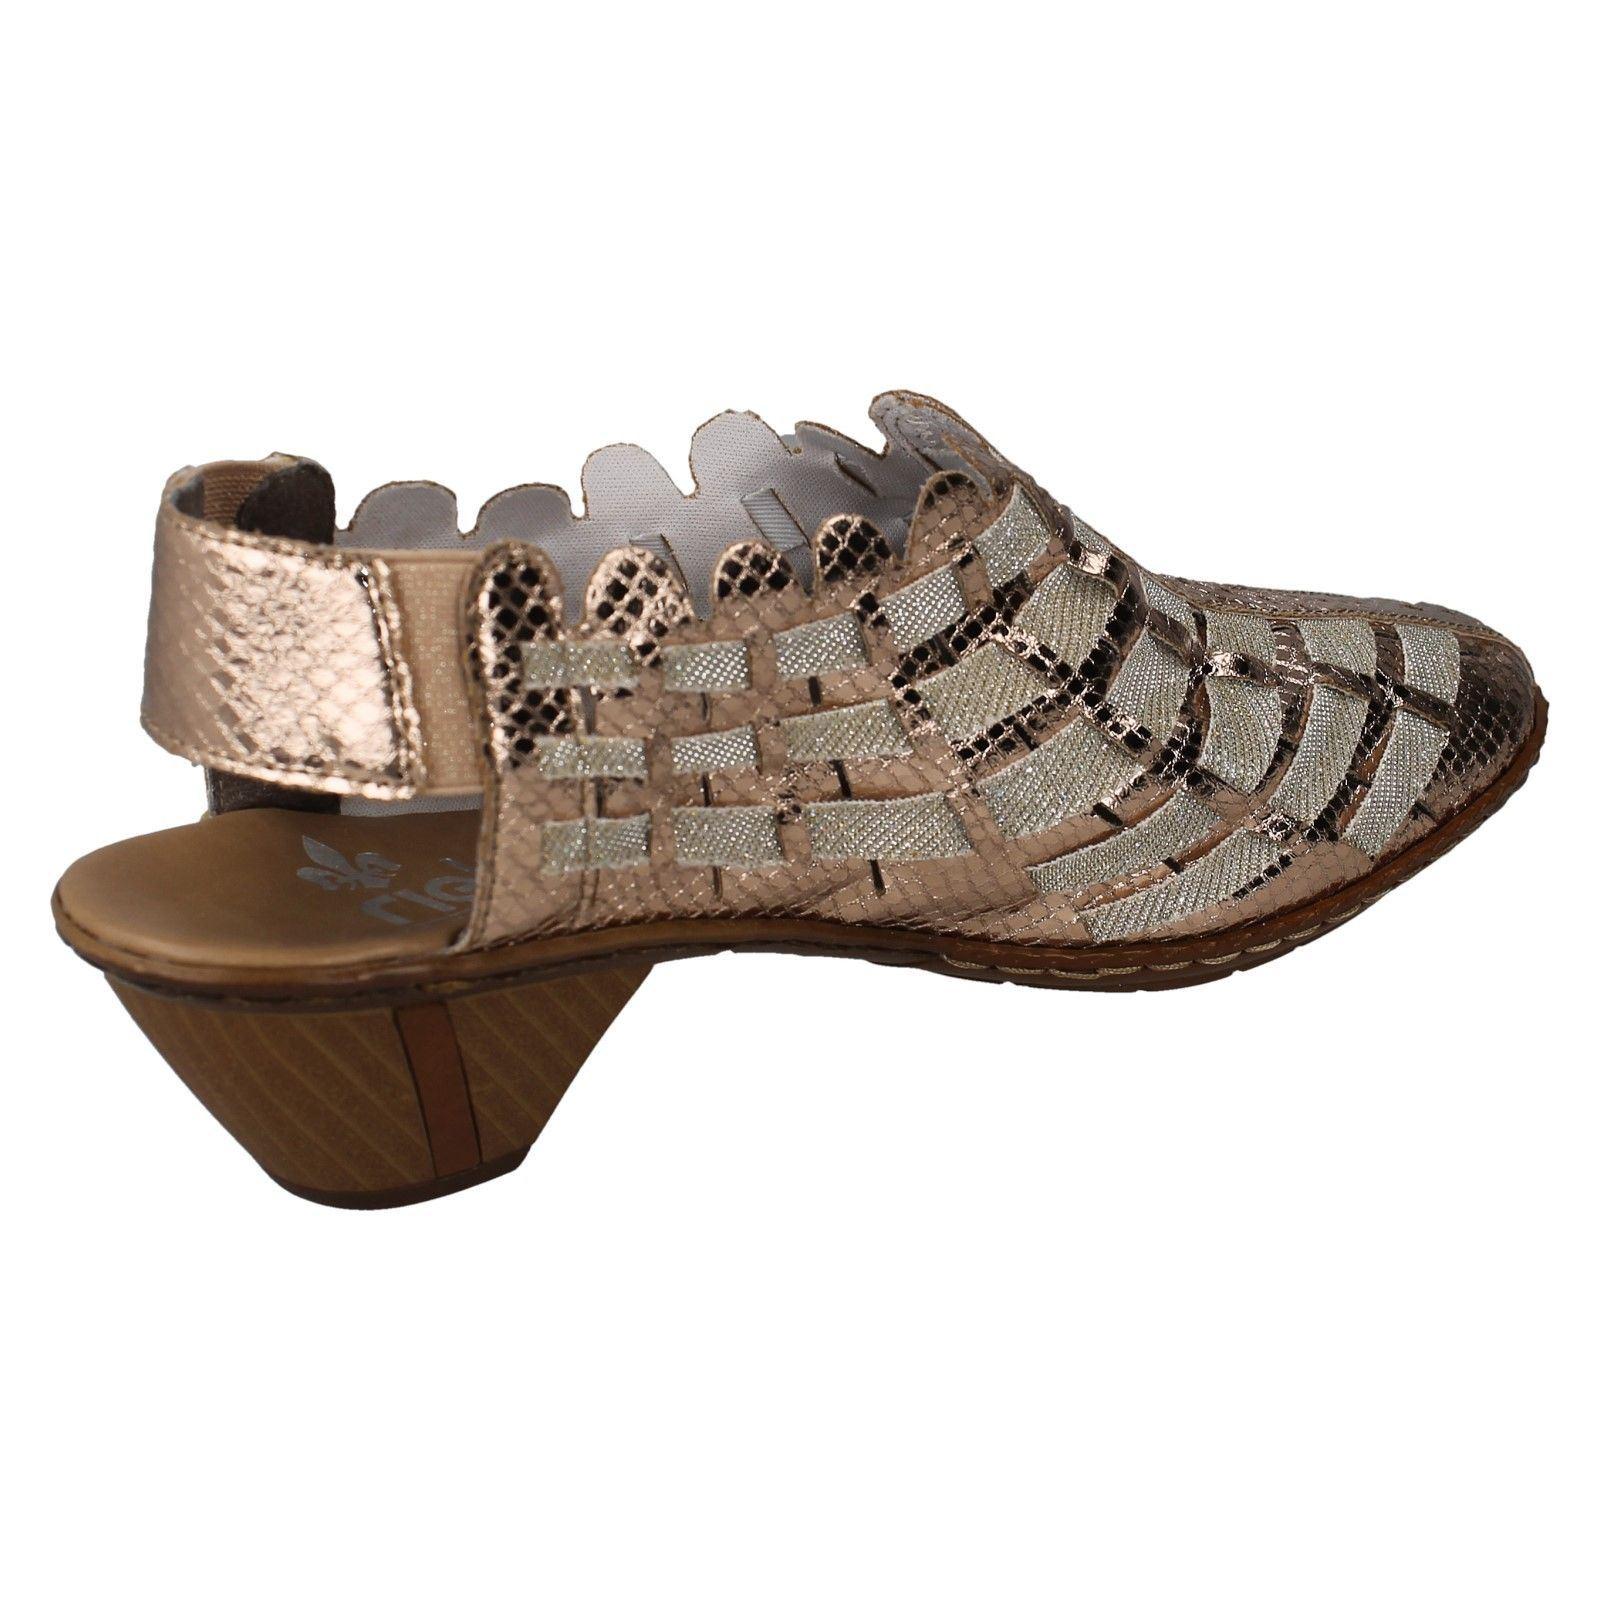 Ladies Slingback Shoes Rieker 46778 Style Metallic r5wrnT4